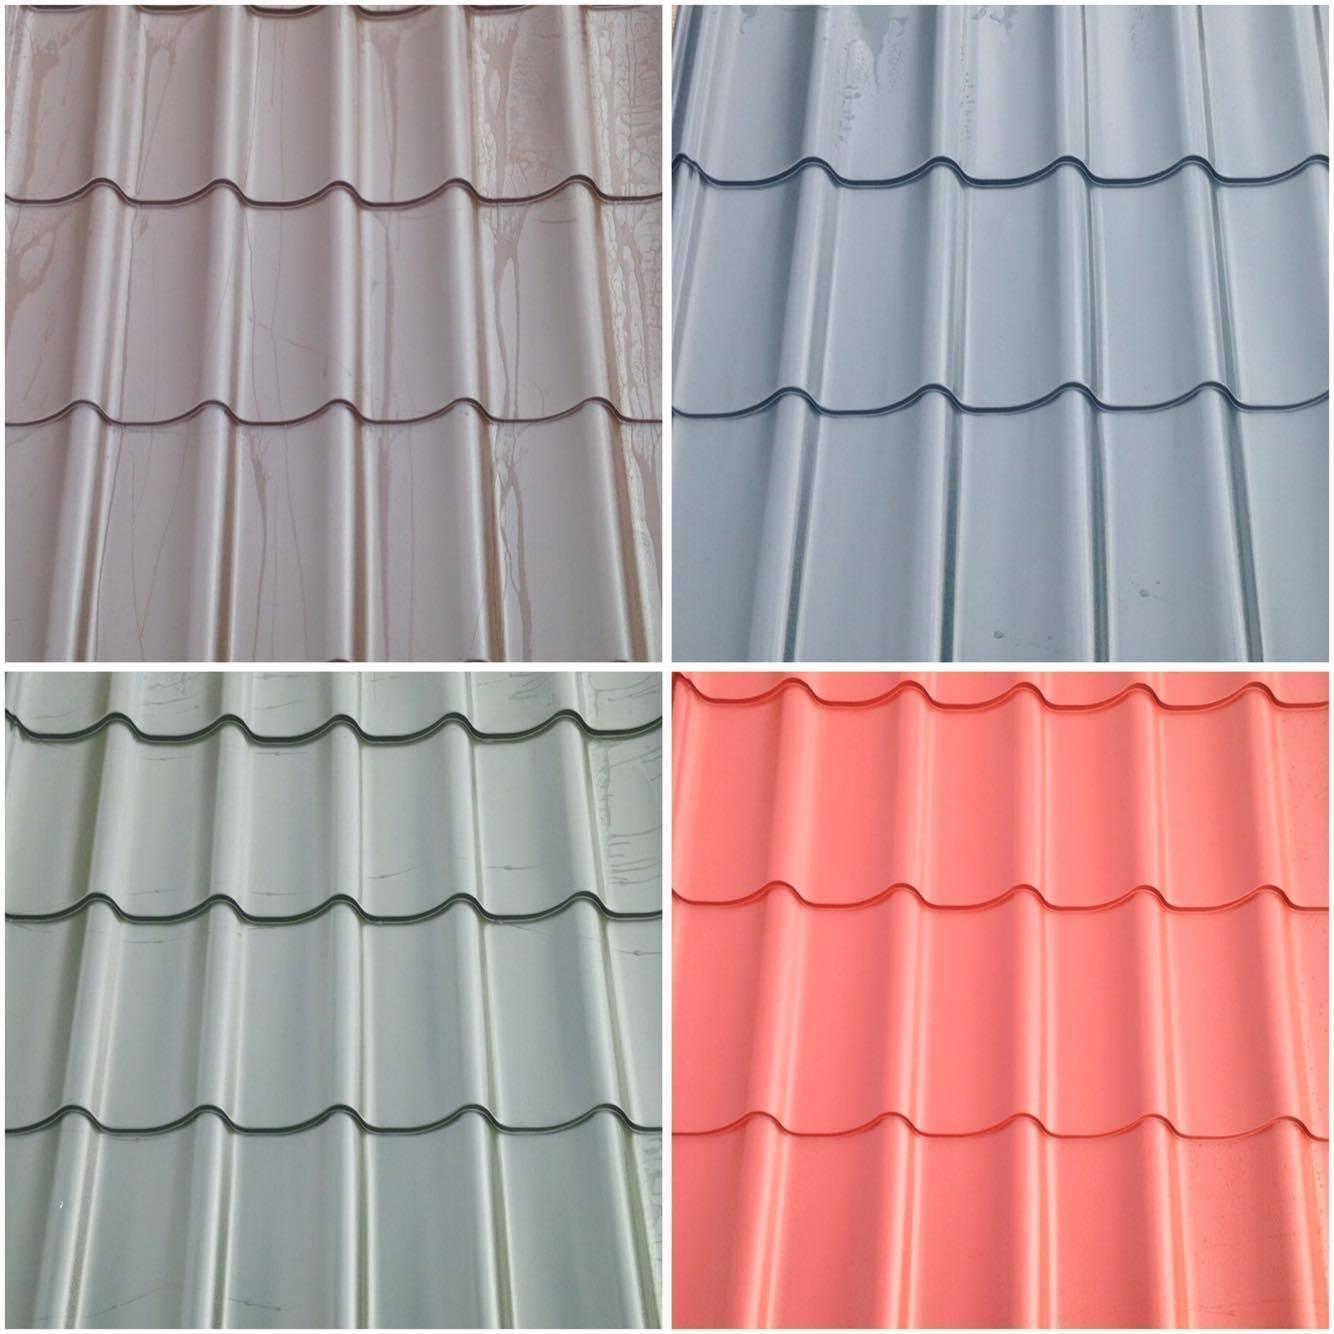 Pan Tile Steel Roofing Sheets Metal Tiled / Tile Roof ...